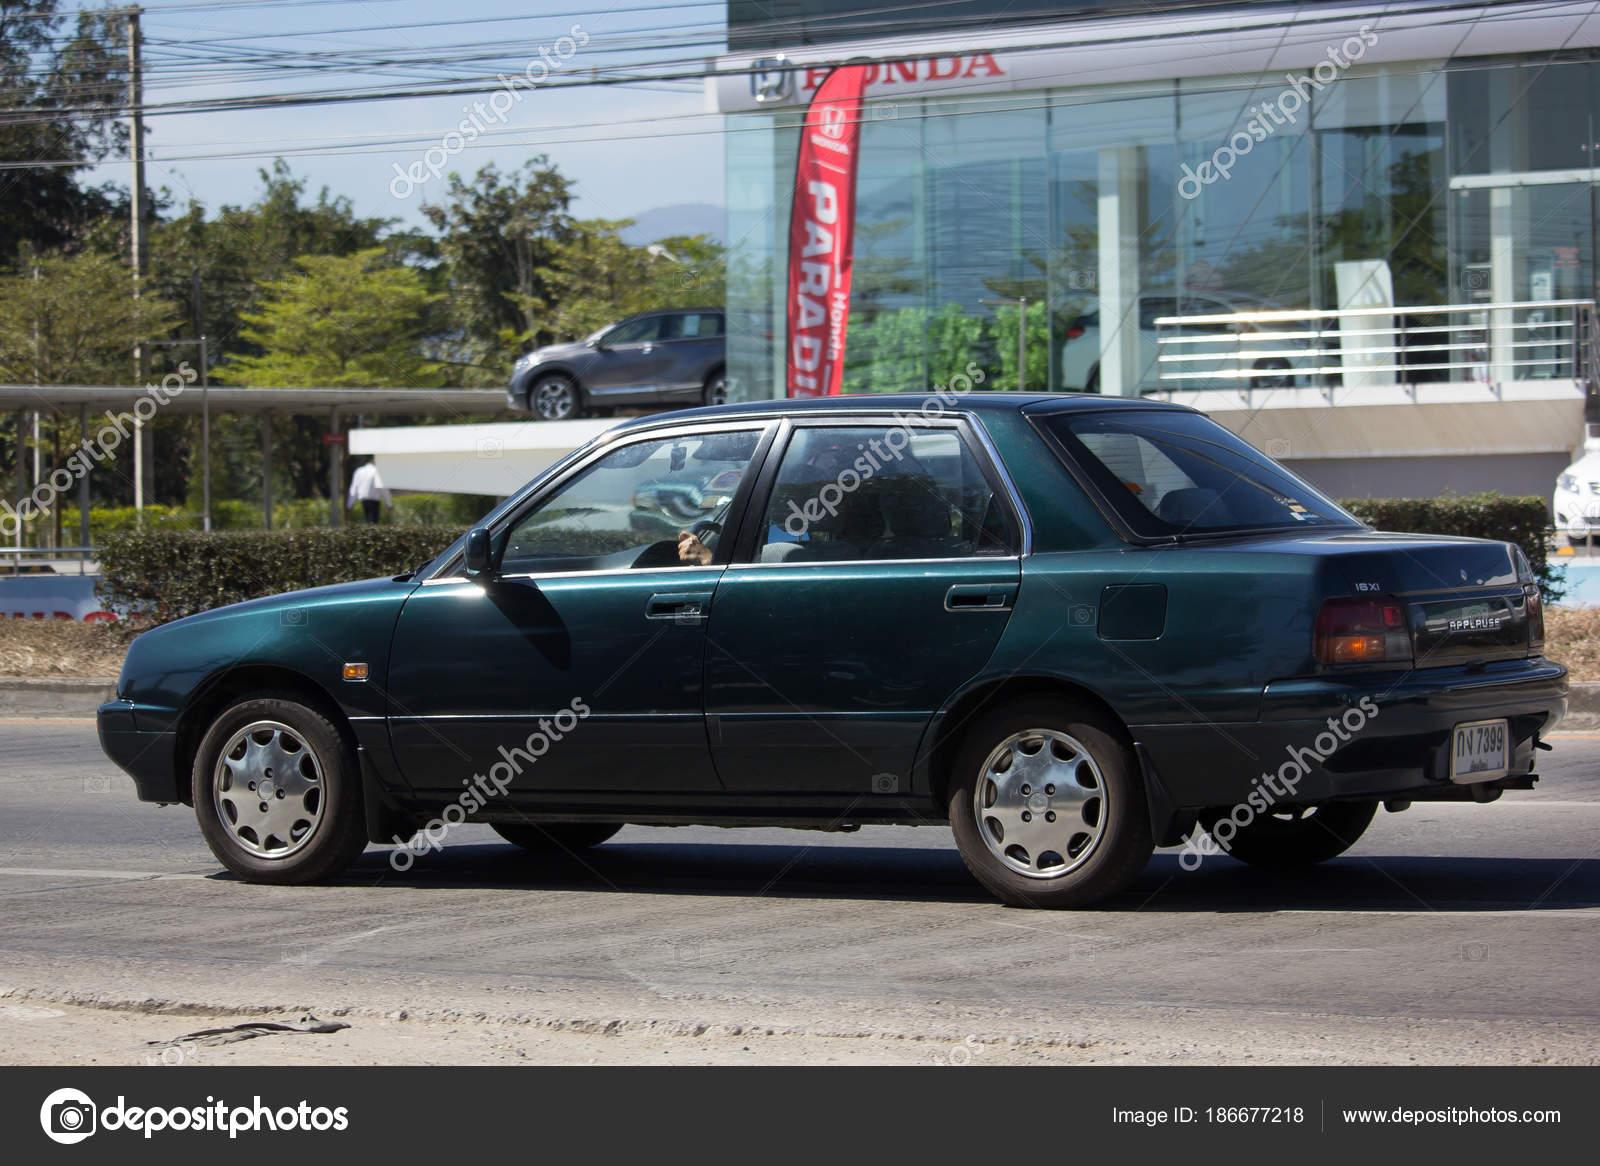 Private Old Daihatsu Applause Car Stock Editorial Photo